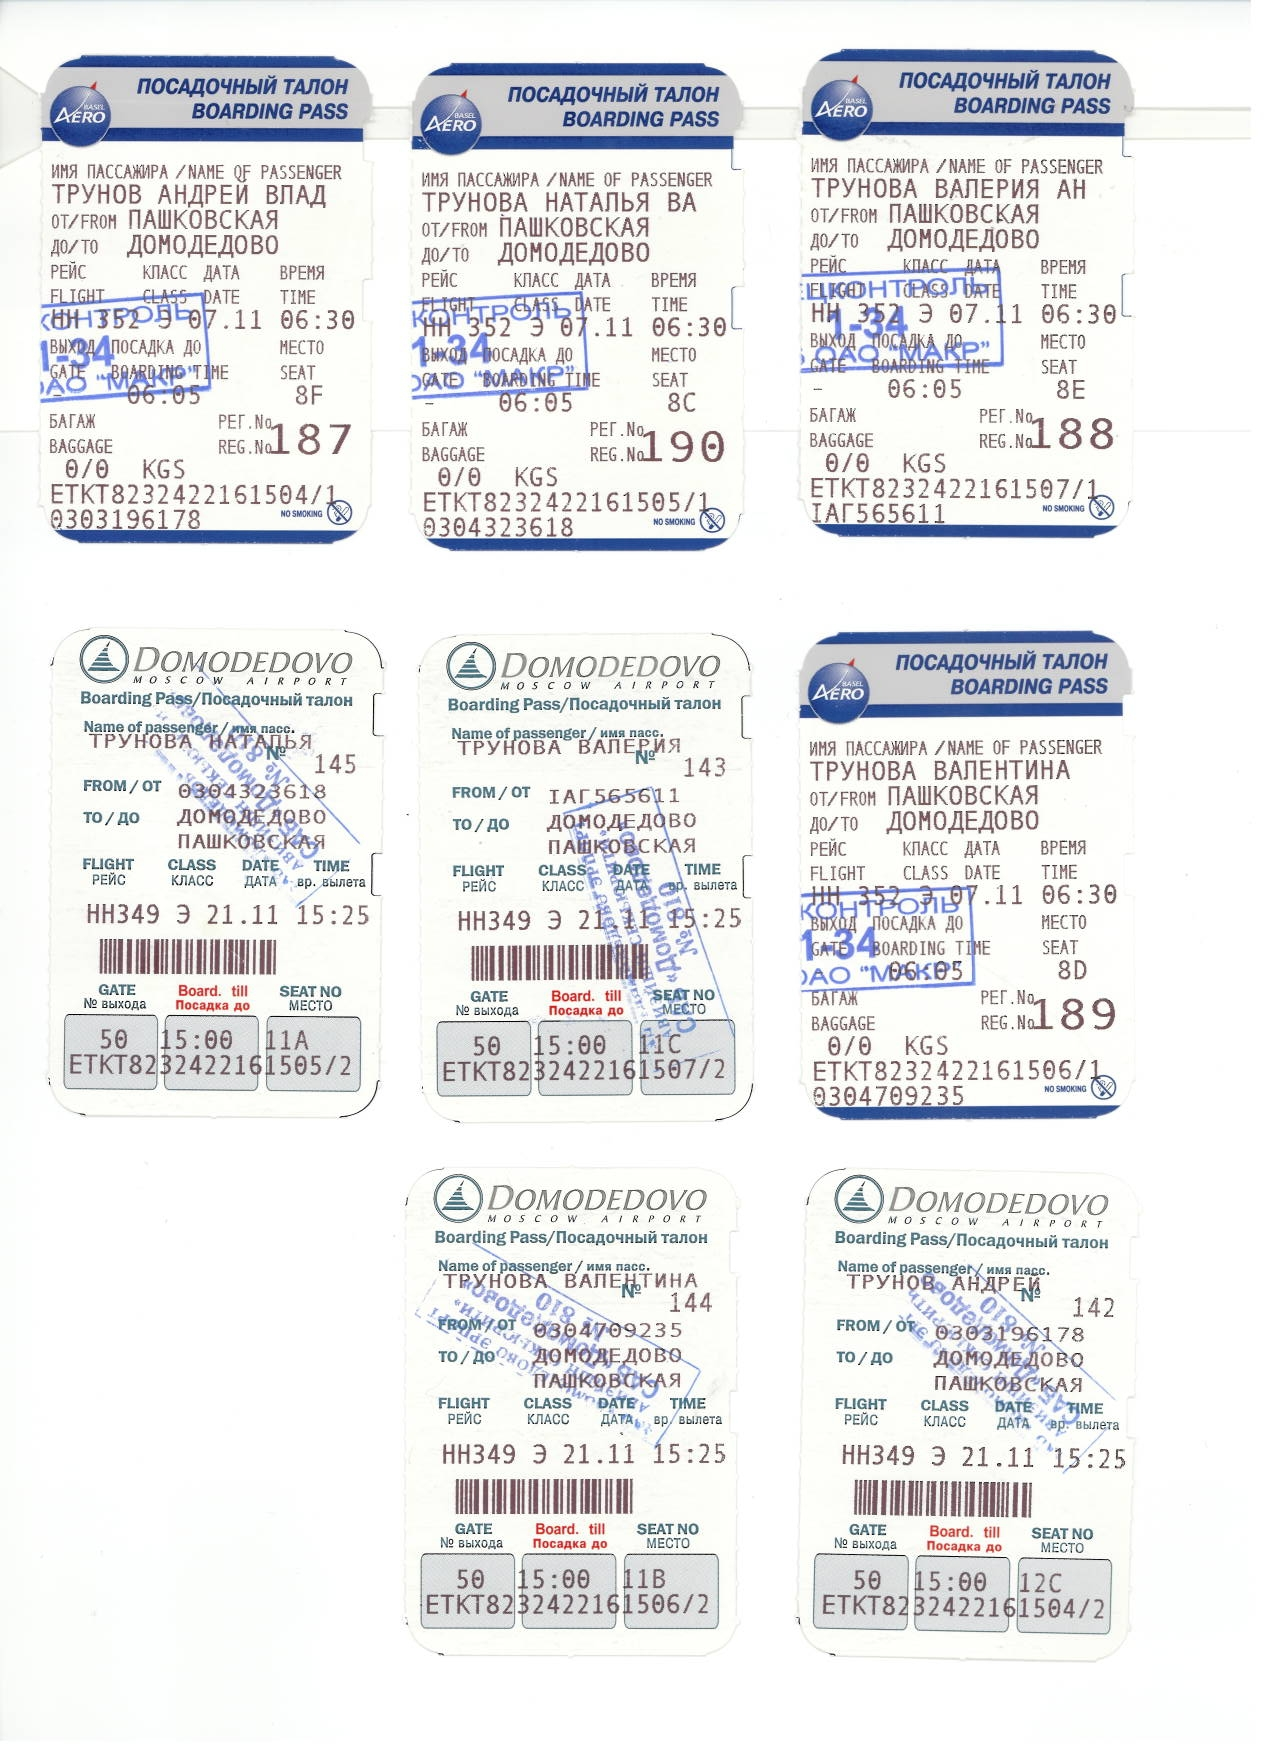 Посадочные талоны Краснодар - Москва - Краснодар